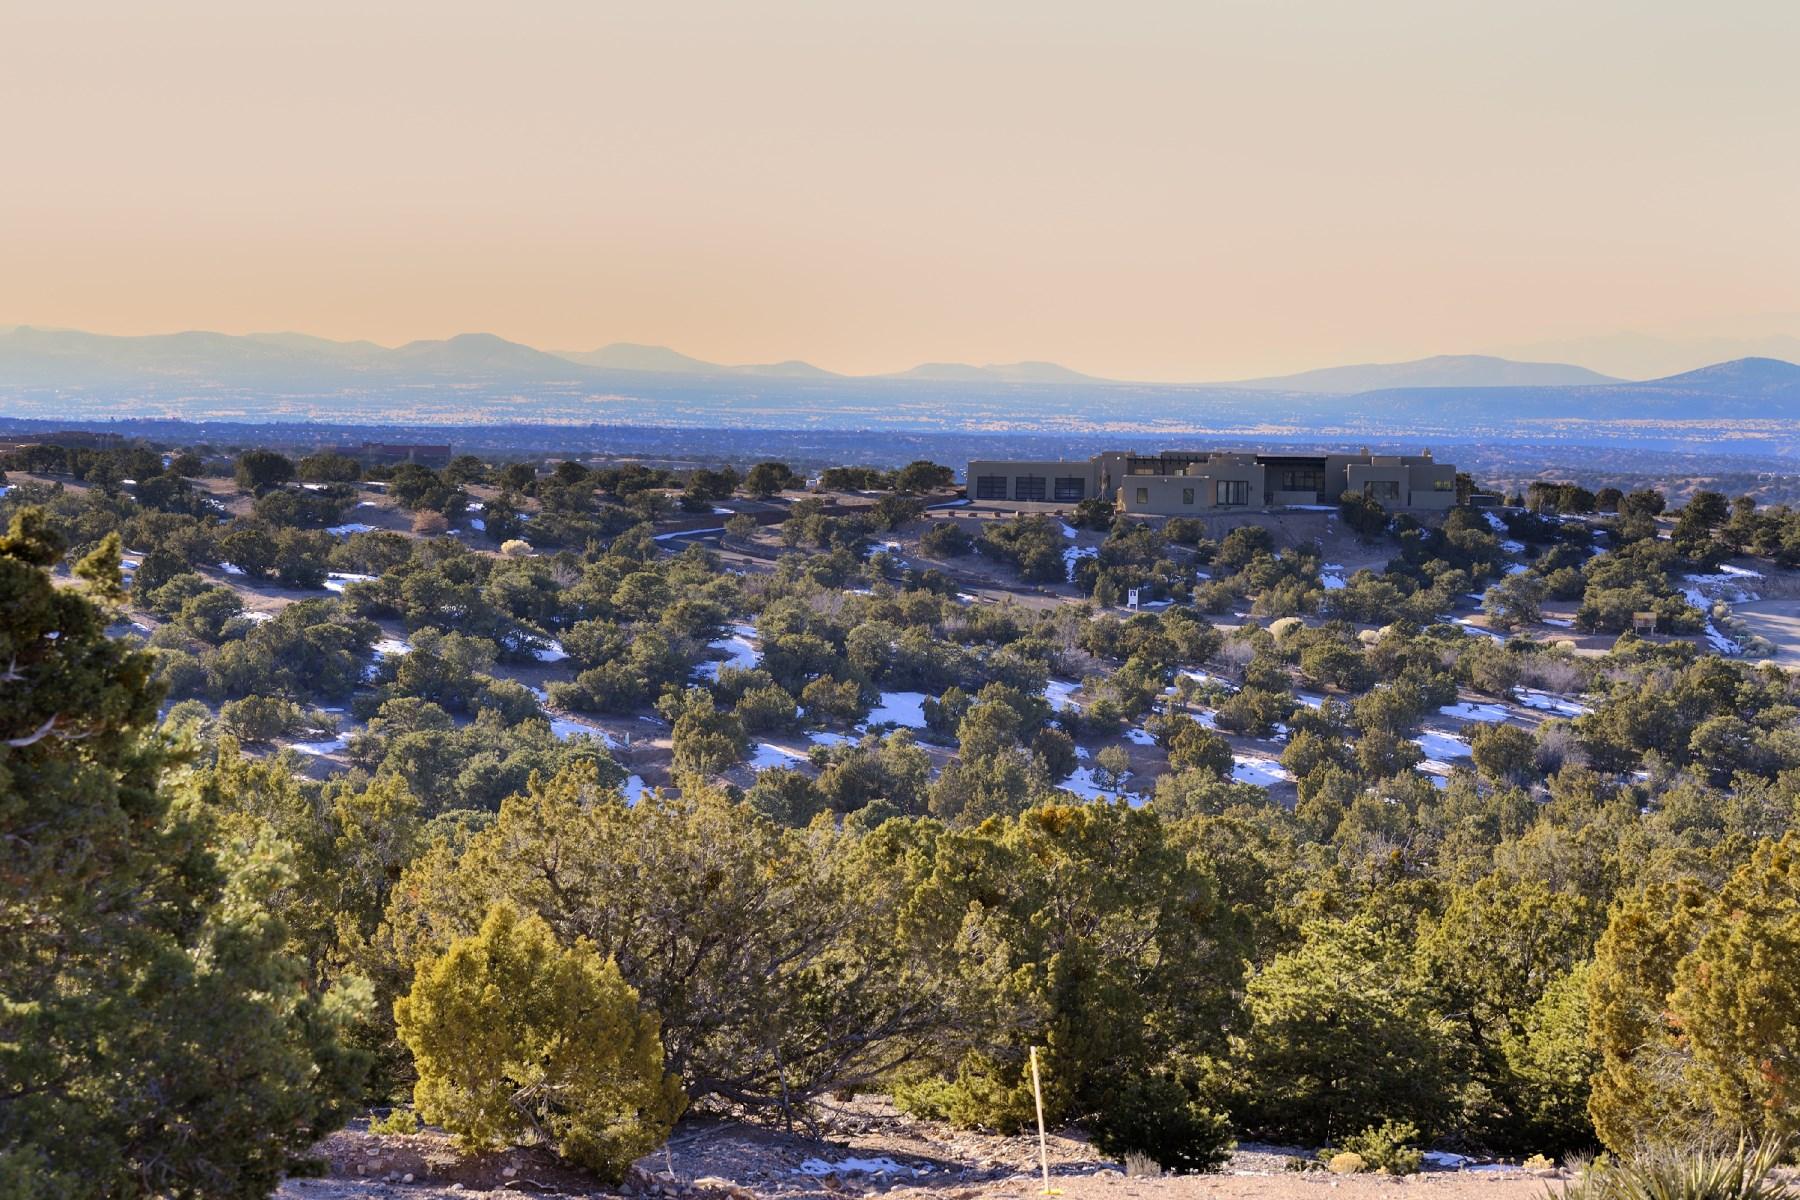 Land for Sale at 6 Ridge Point Lot 12 6 Ridge Point Court Lot 12 Santa Fe, New Mexico 87505 United States